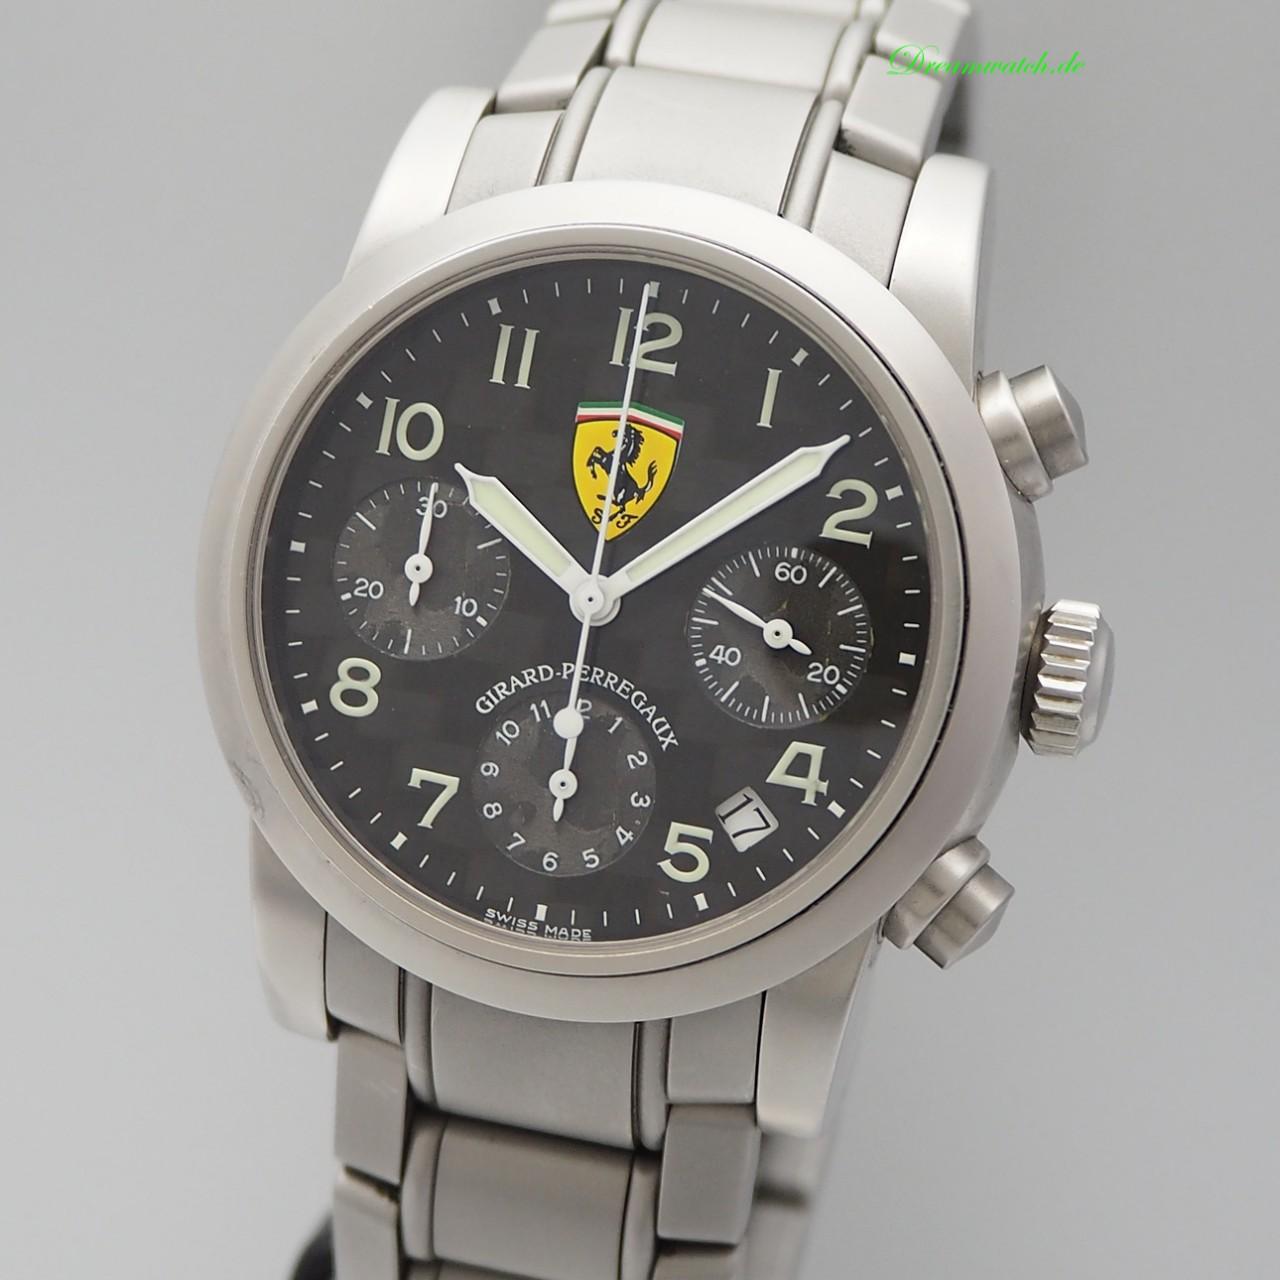 Girard Perregaux Ferrari Chronograph Carbon Ref.: 8020 Stahl/ Stahl